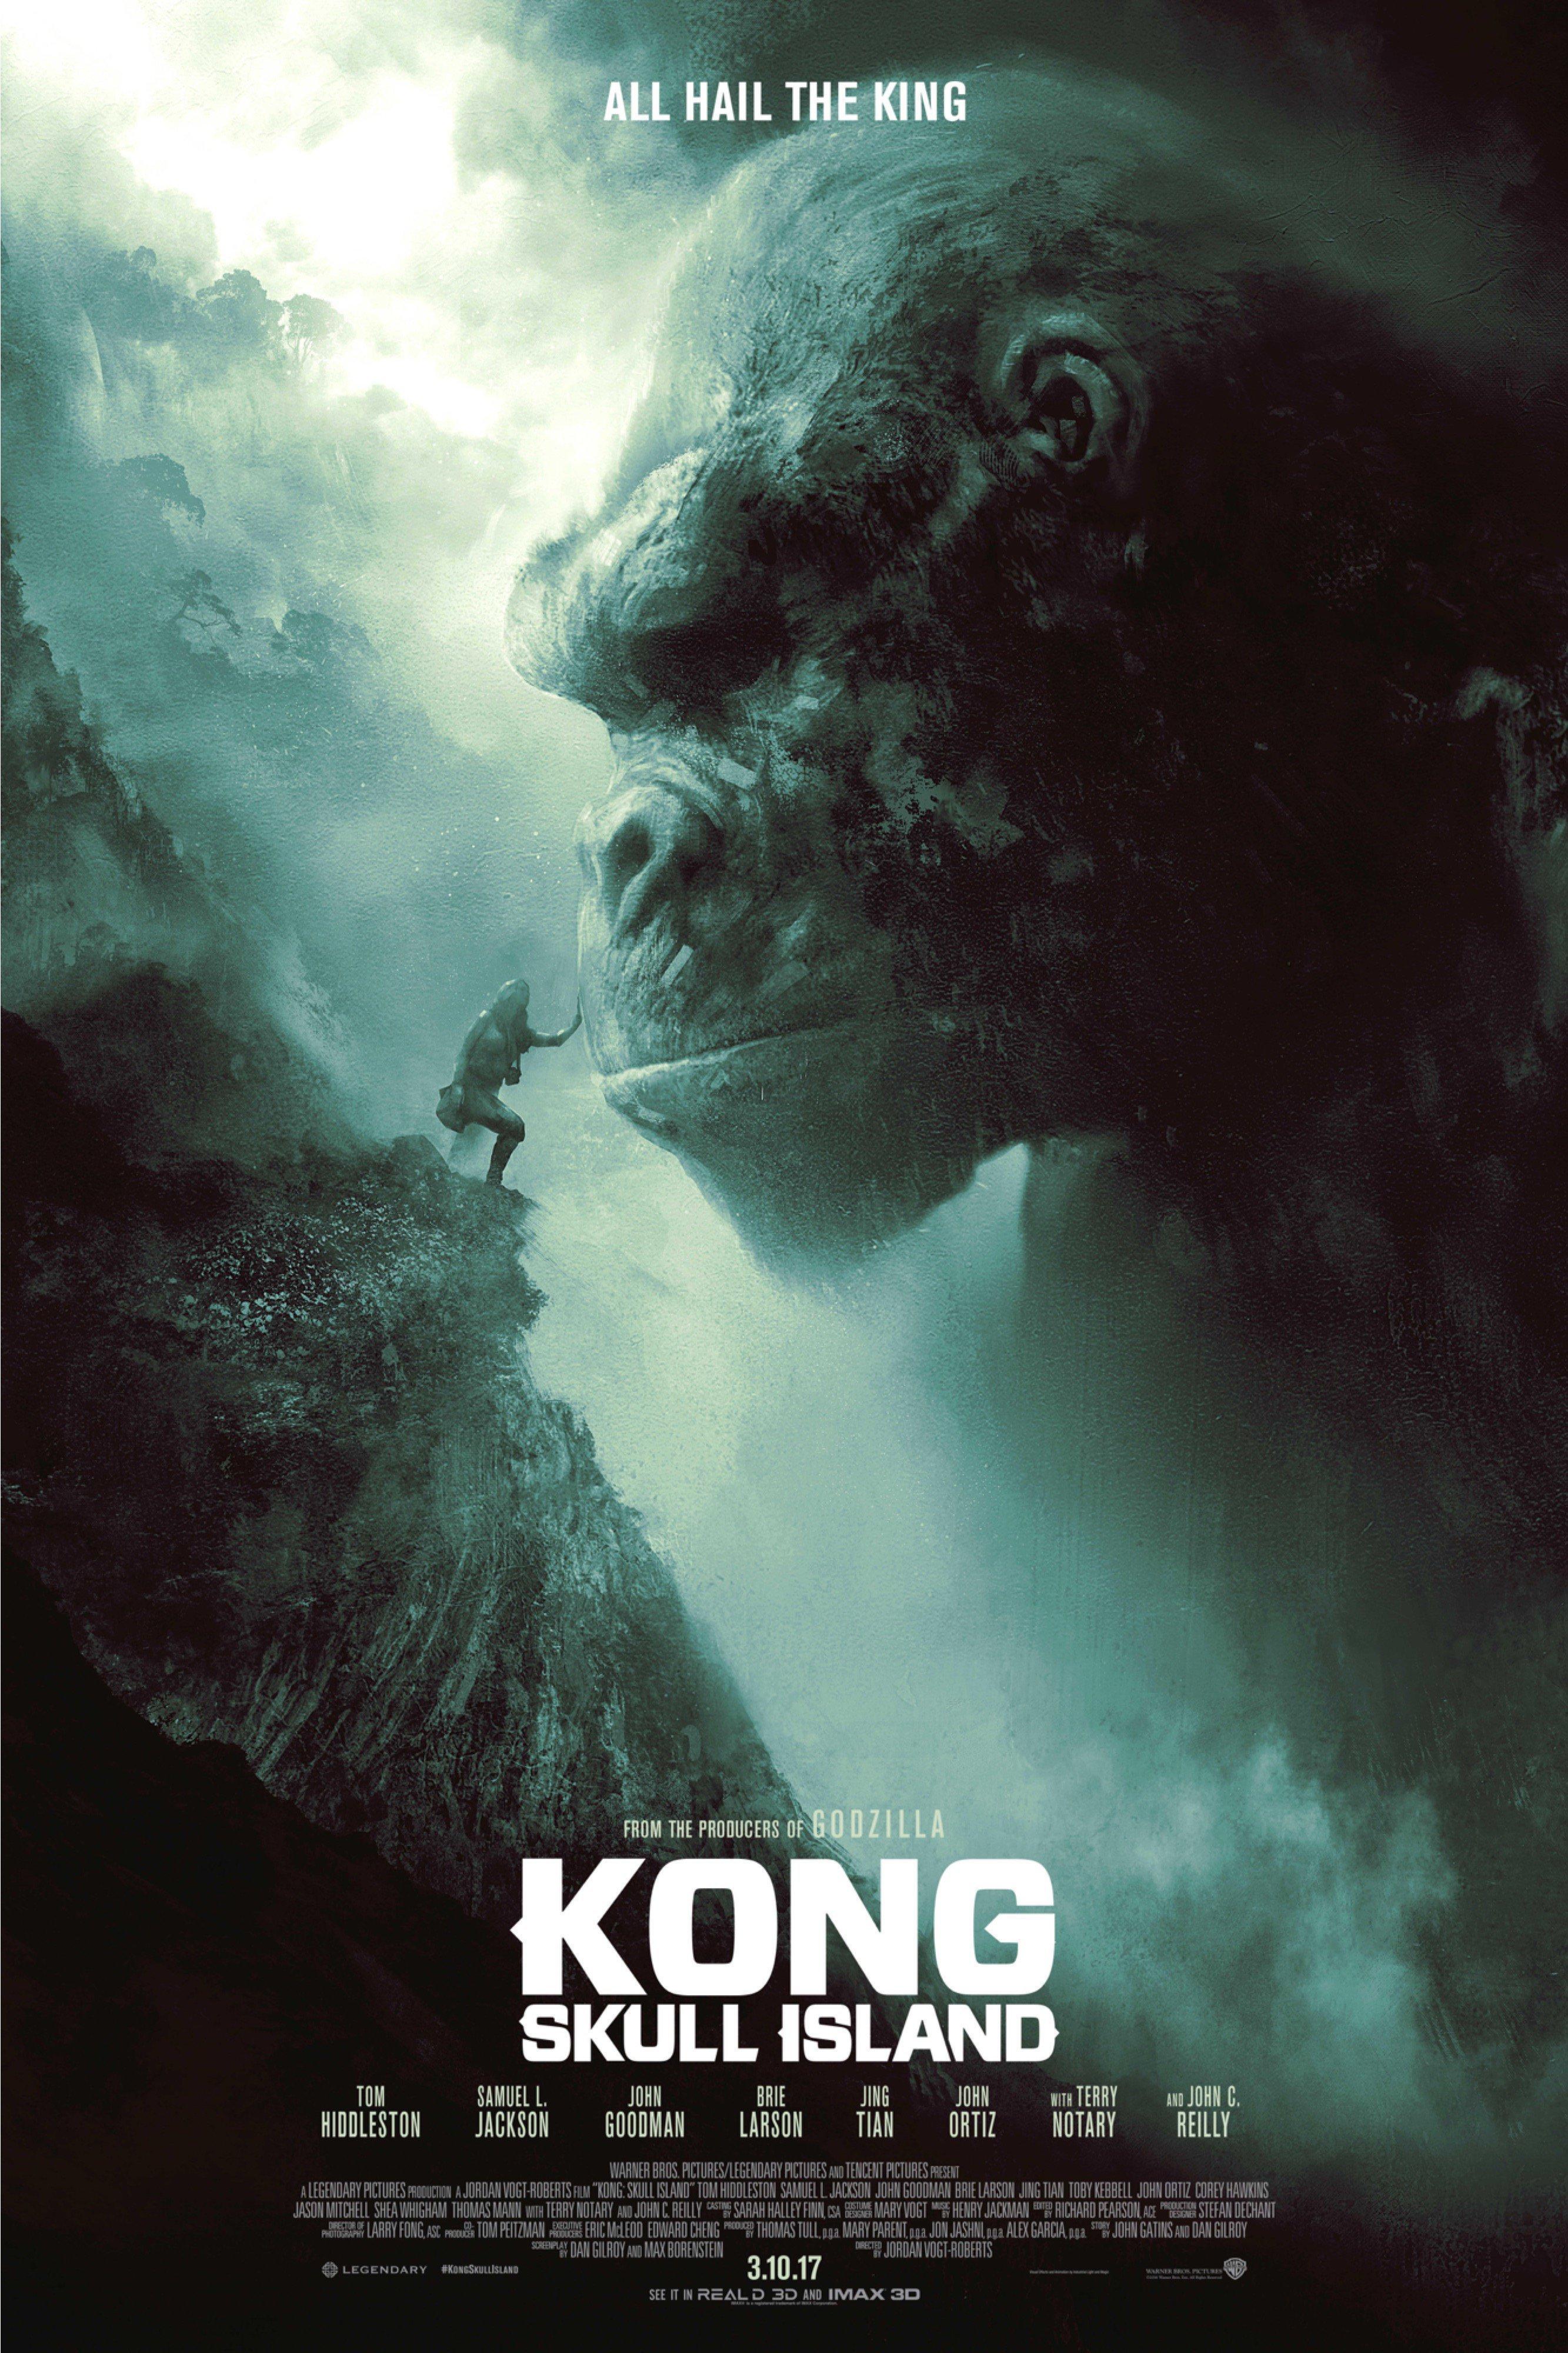 Kong Skull Island Critiqe